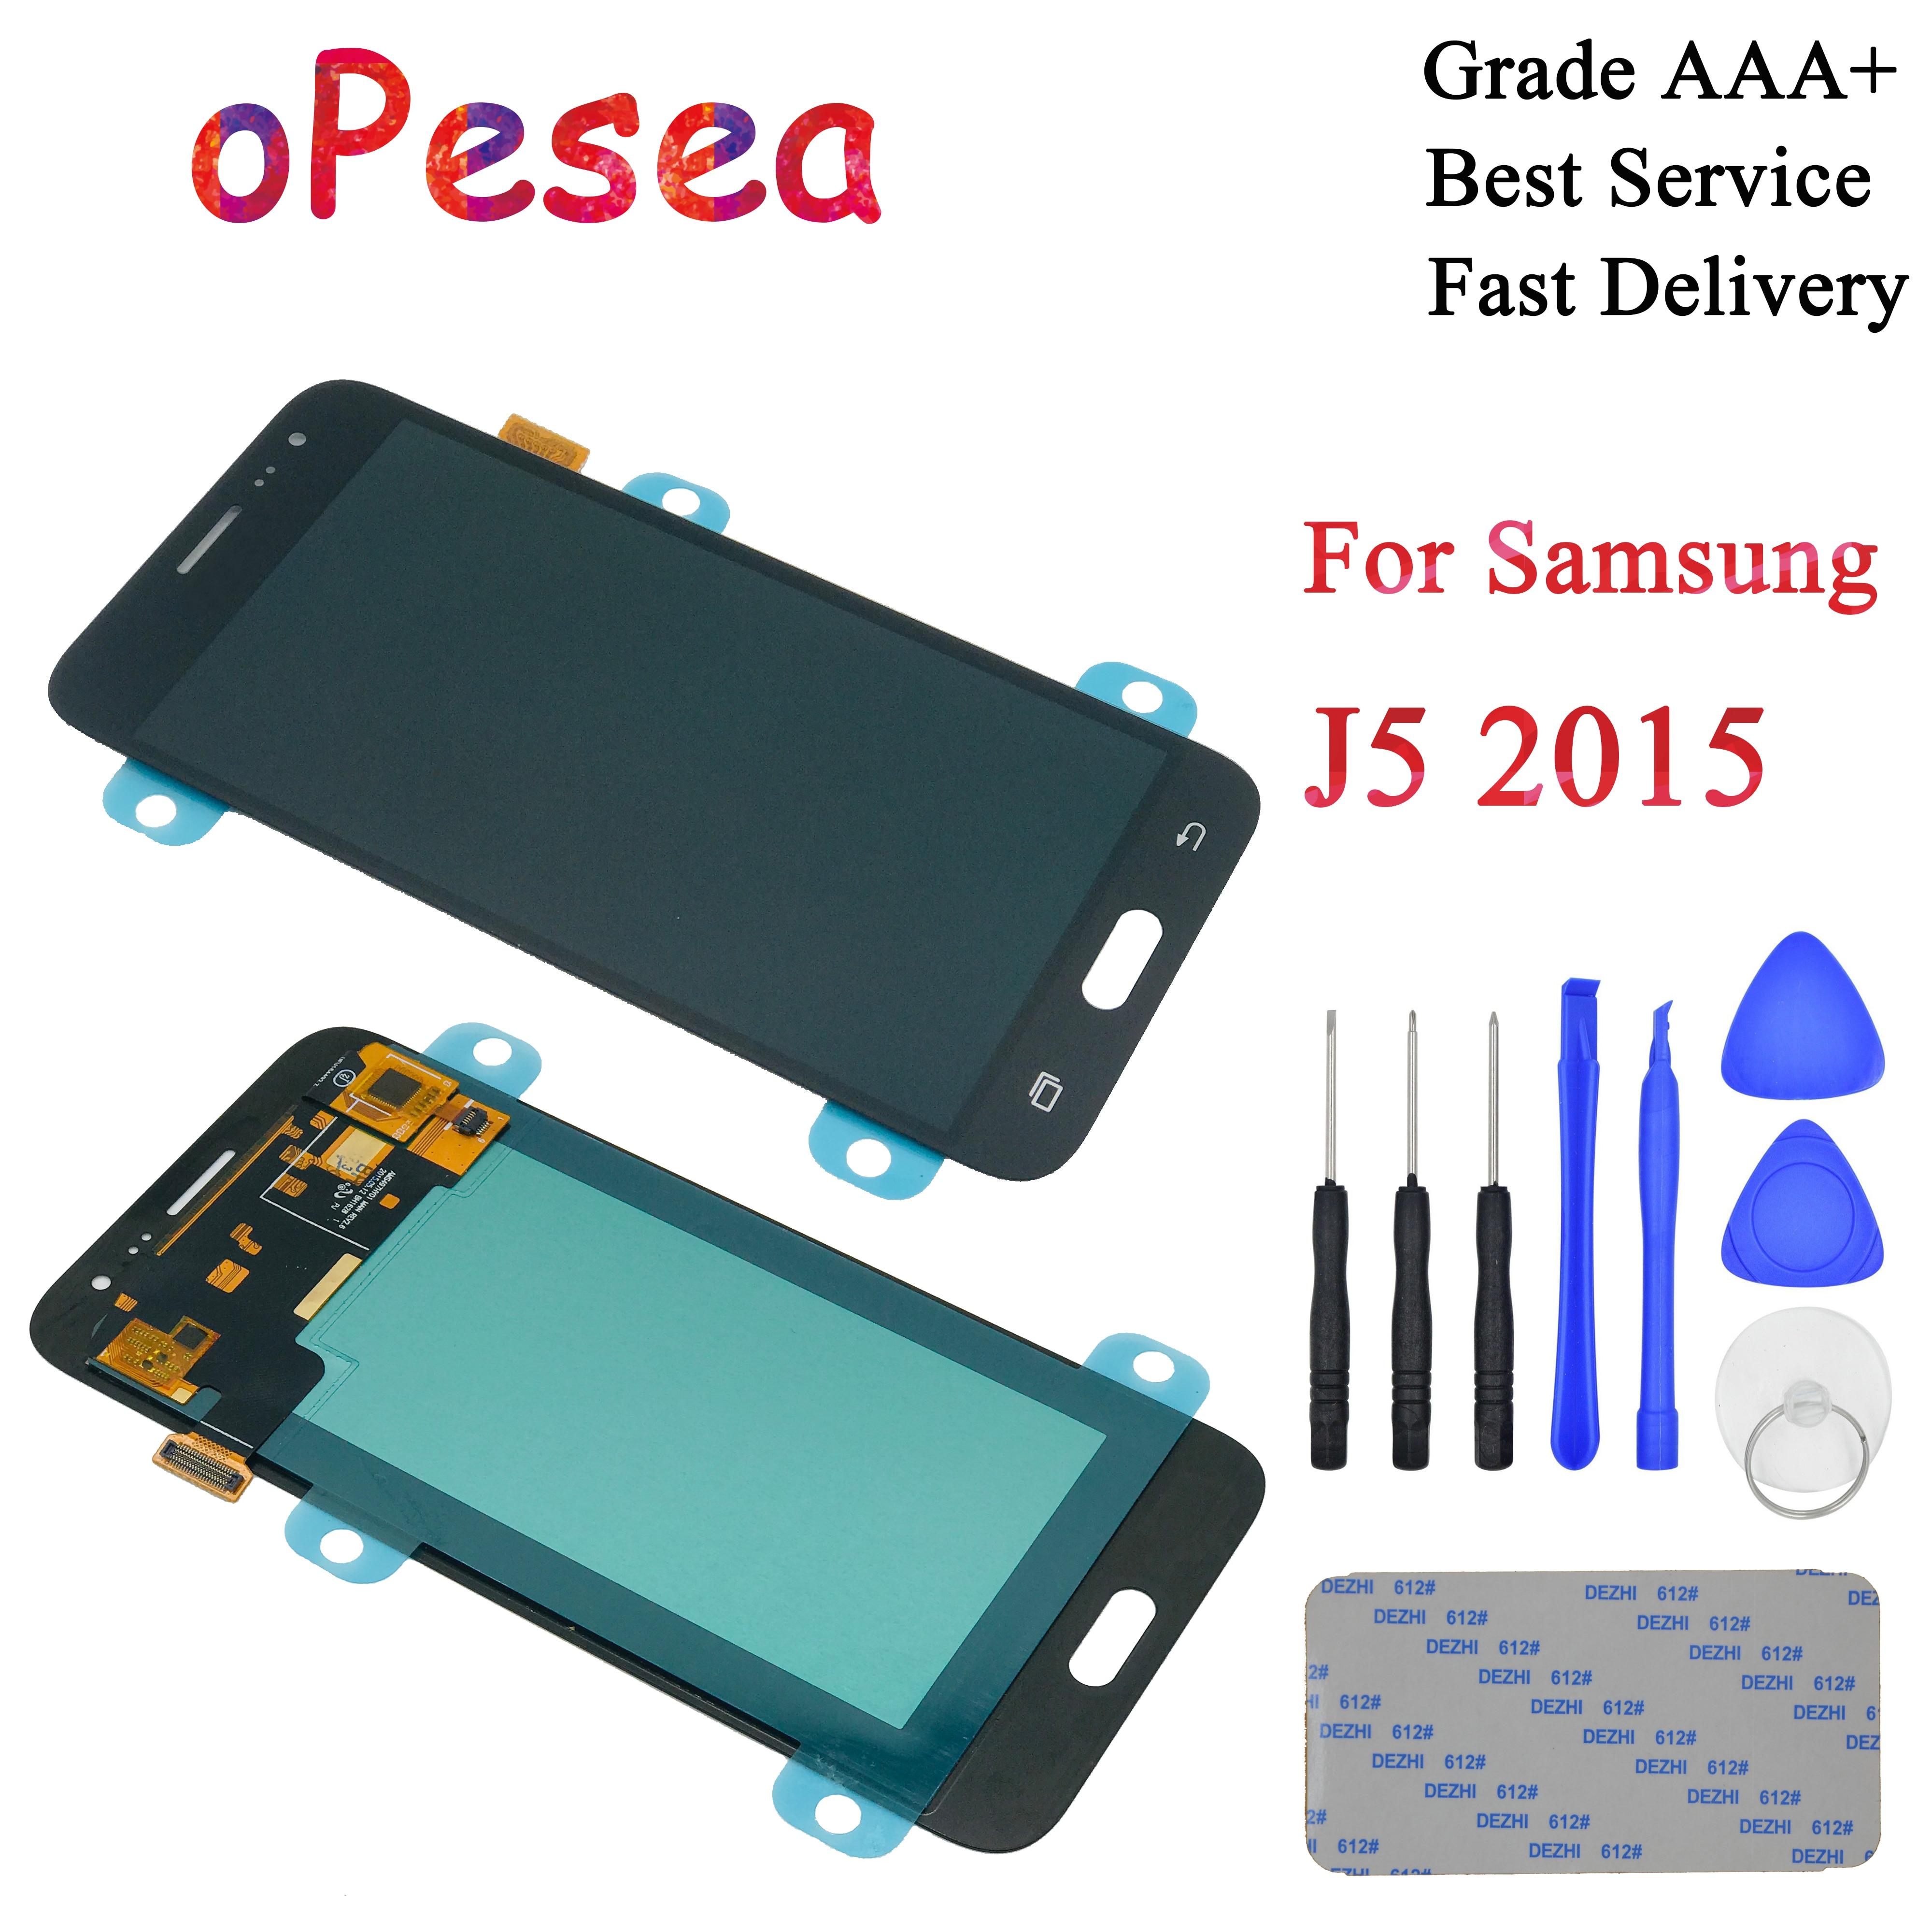 oPesea AMOLED For Samsung Galaxy J5 2015 J500 J500F J500FN J500H LCD Display Panel Touch Screen Digitizer Glass Sensor Assembly